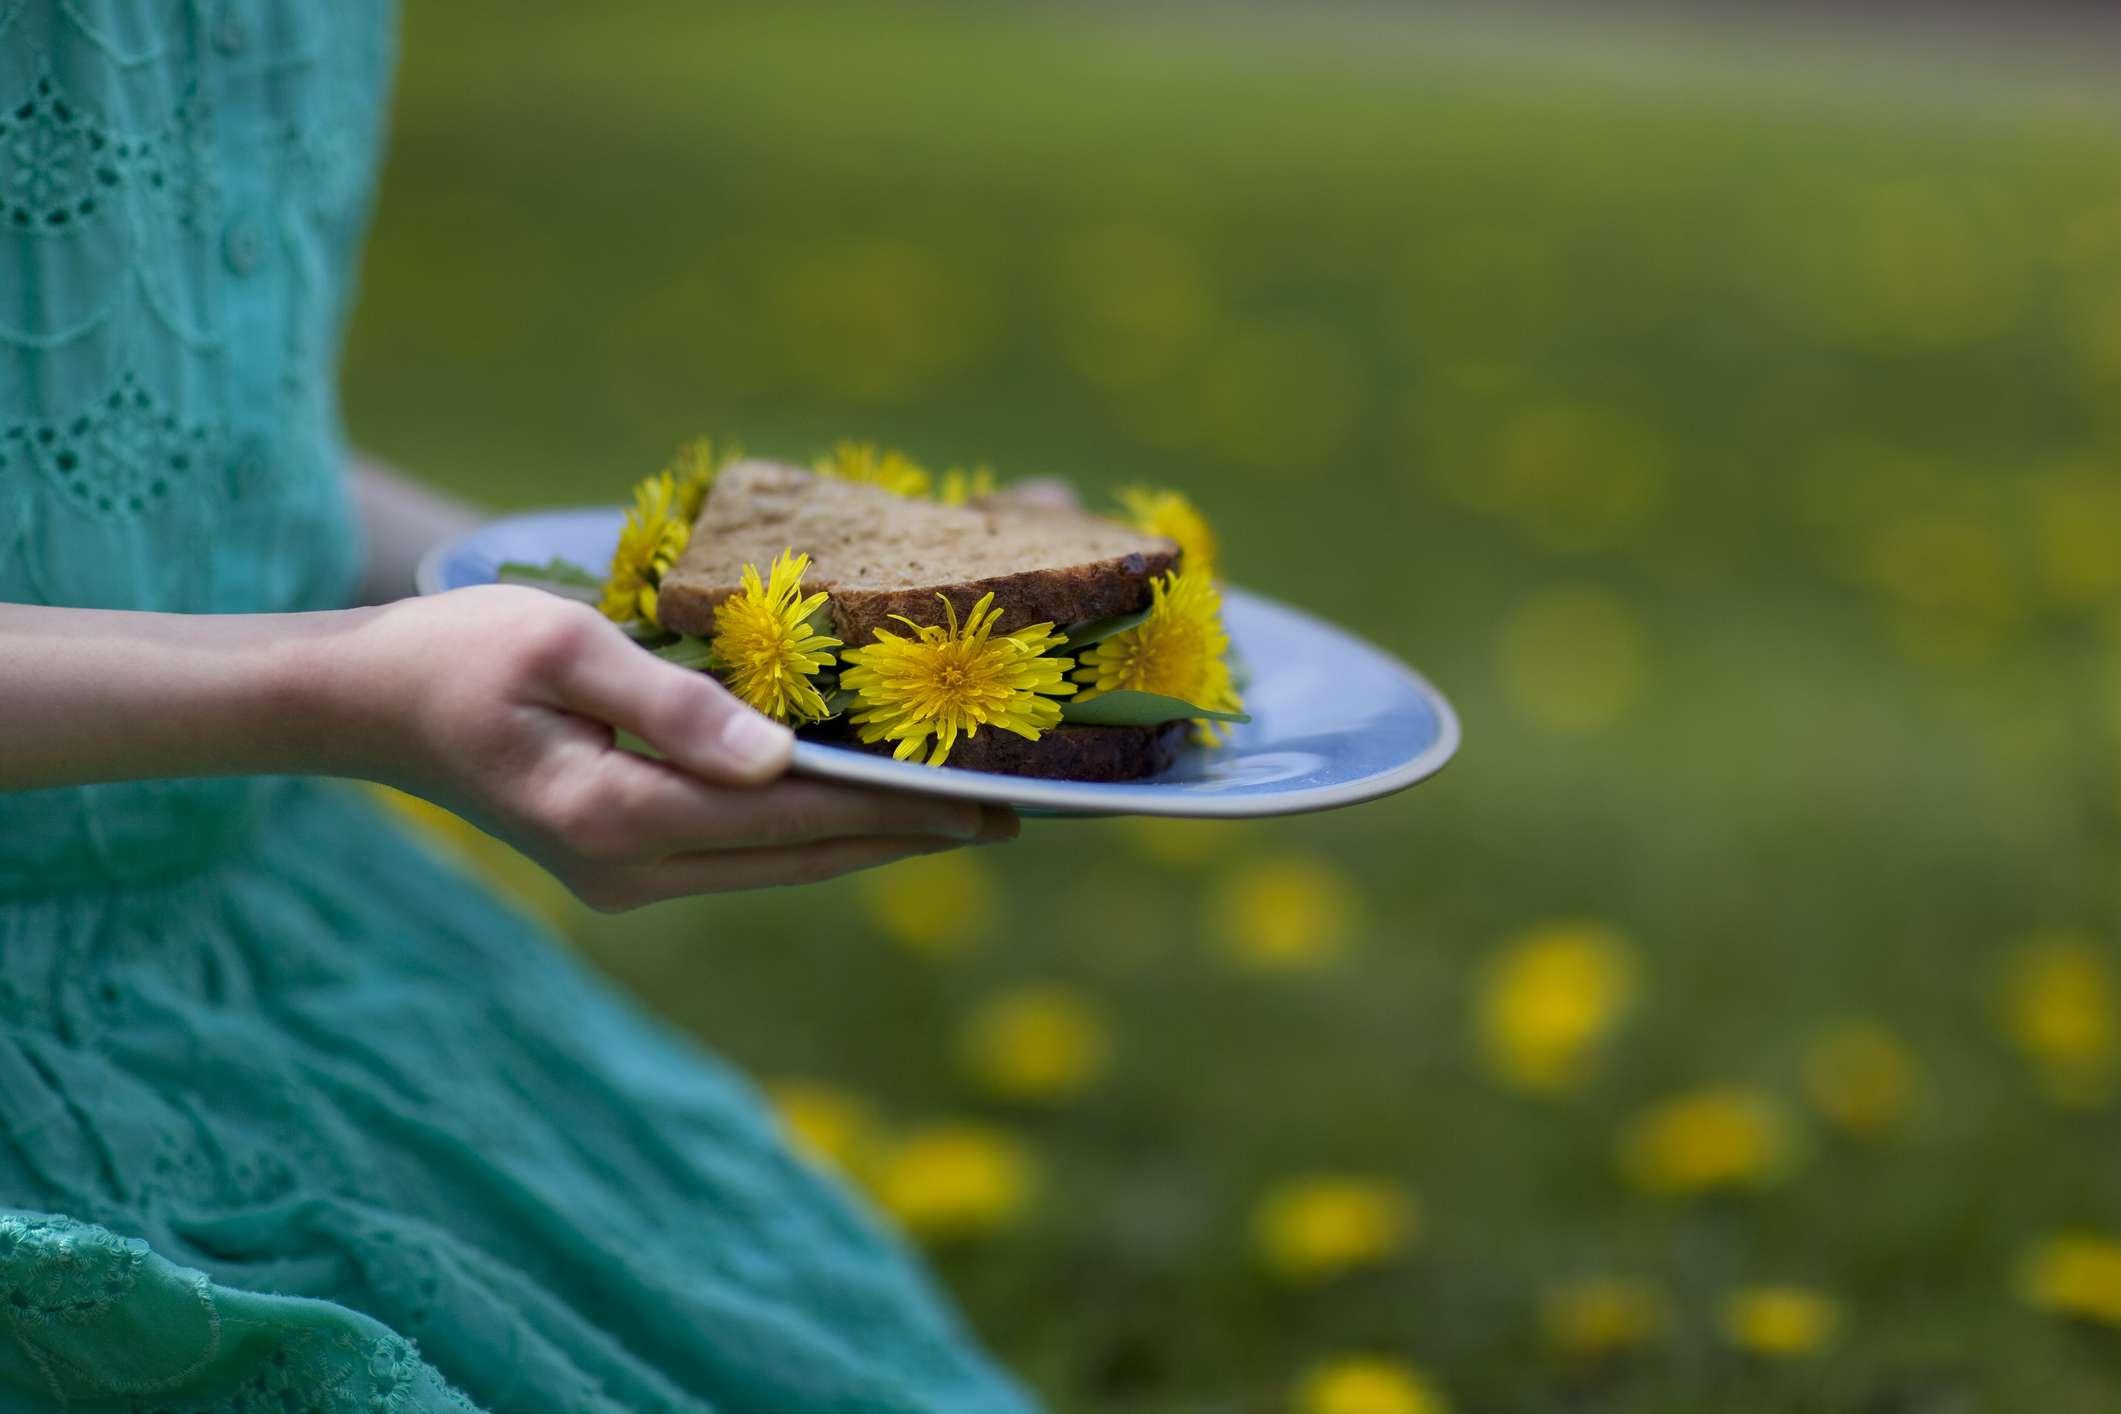 Girl's hands holding dandelion sandwich on a plate